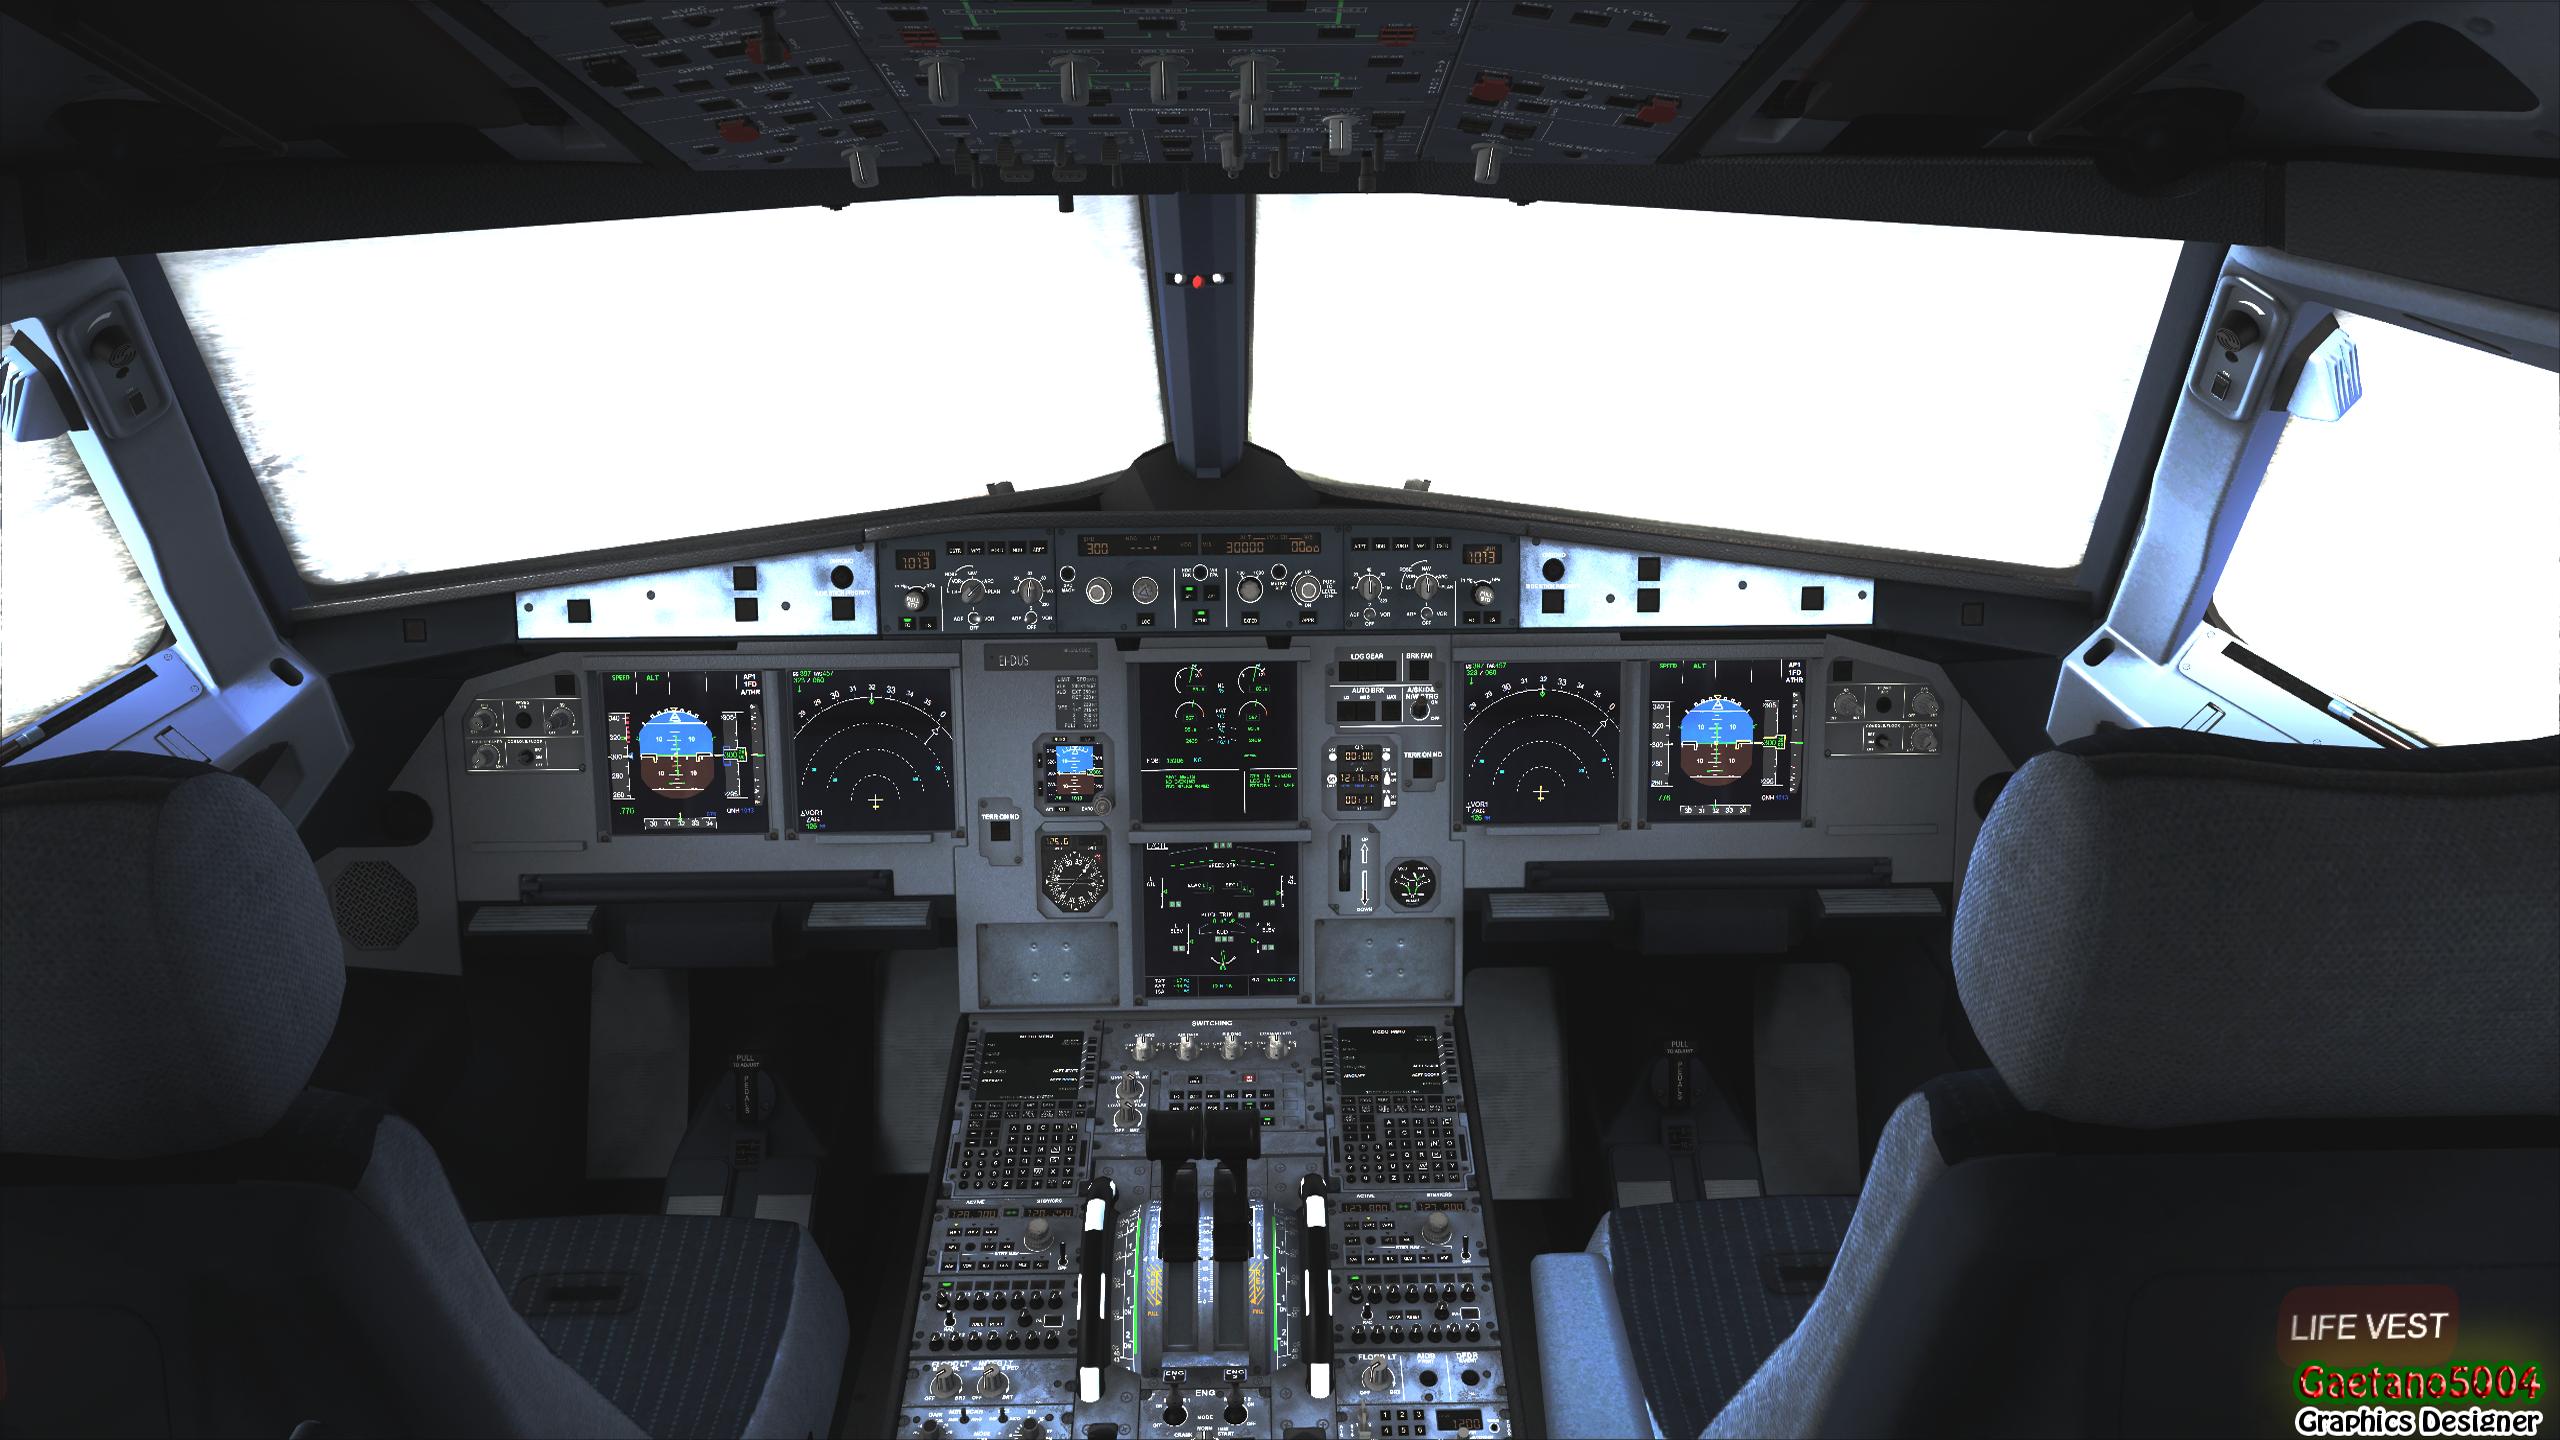 Airbus A320 Cockpit by Gaetano5004